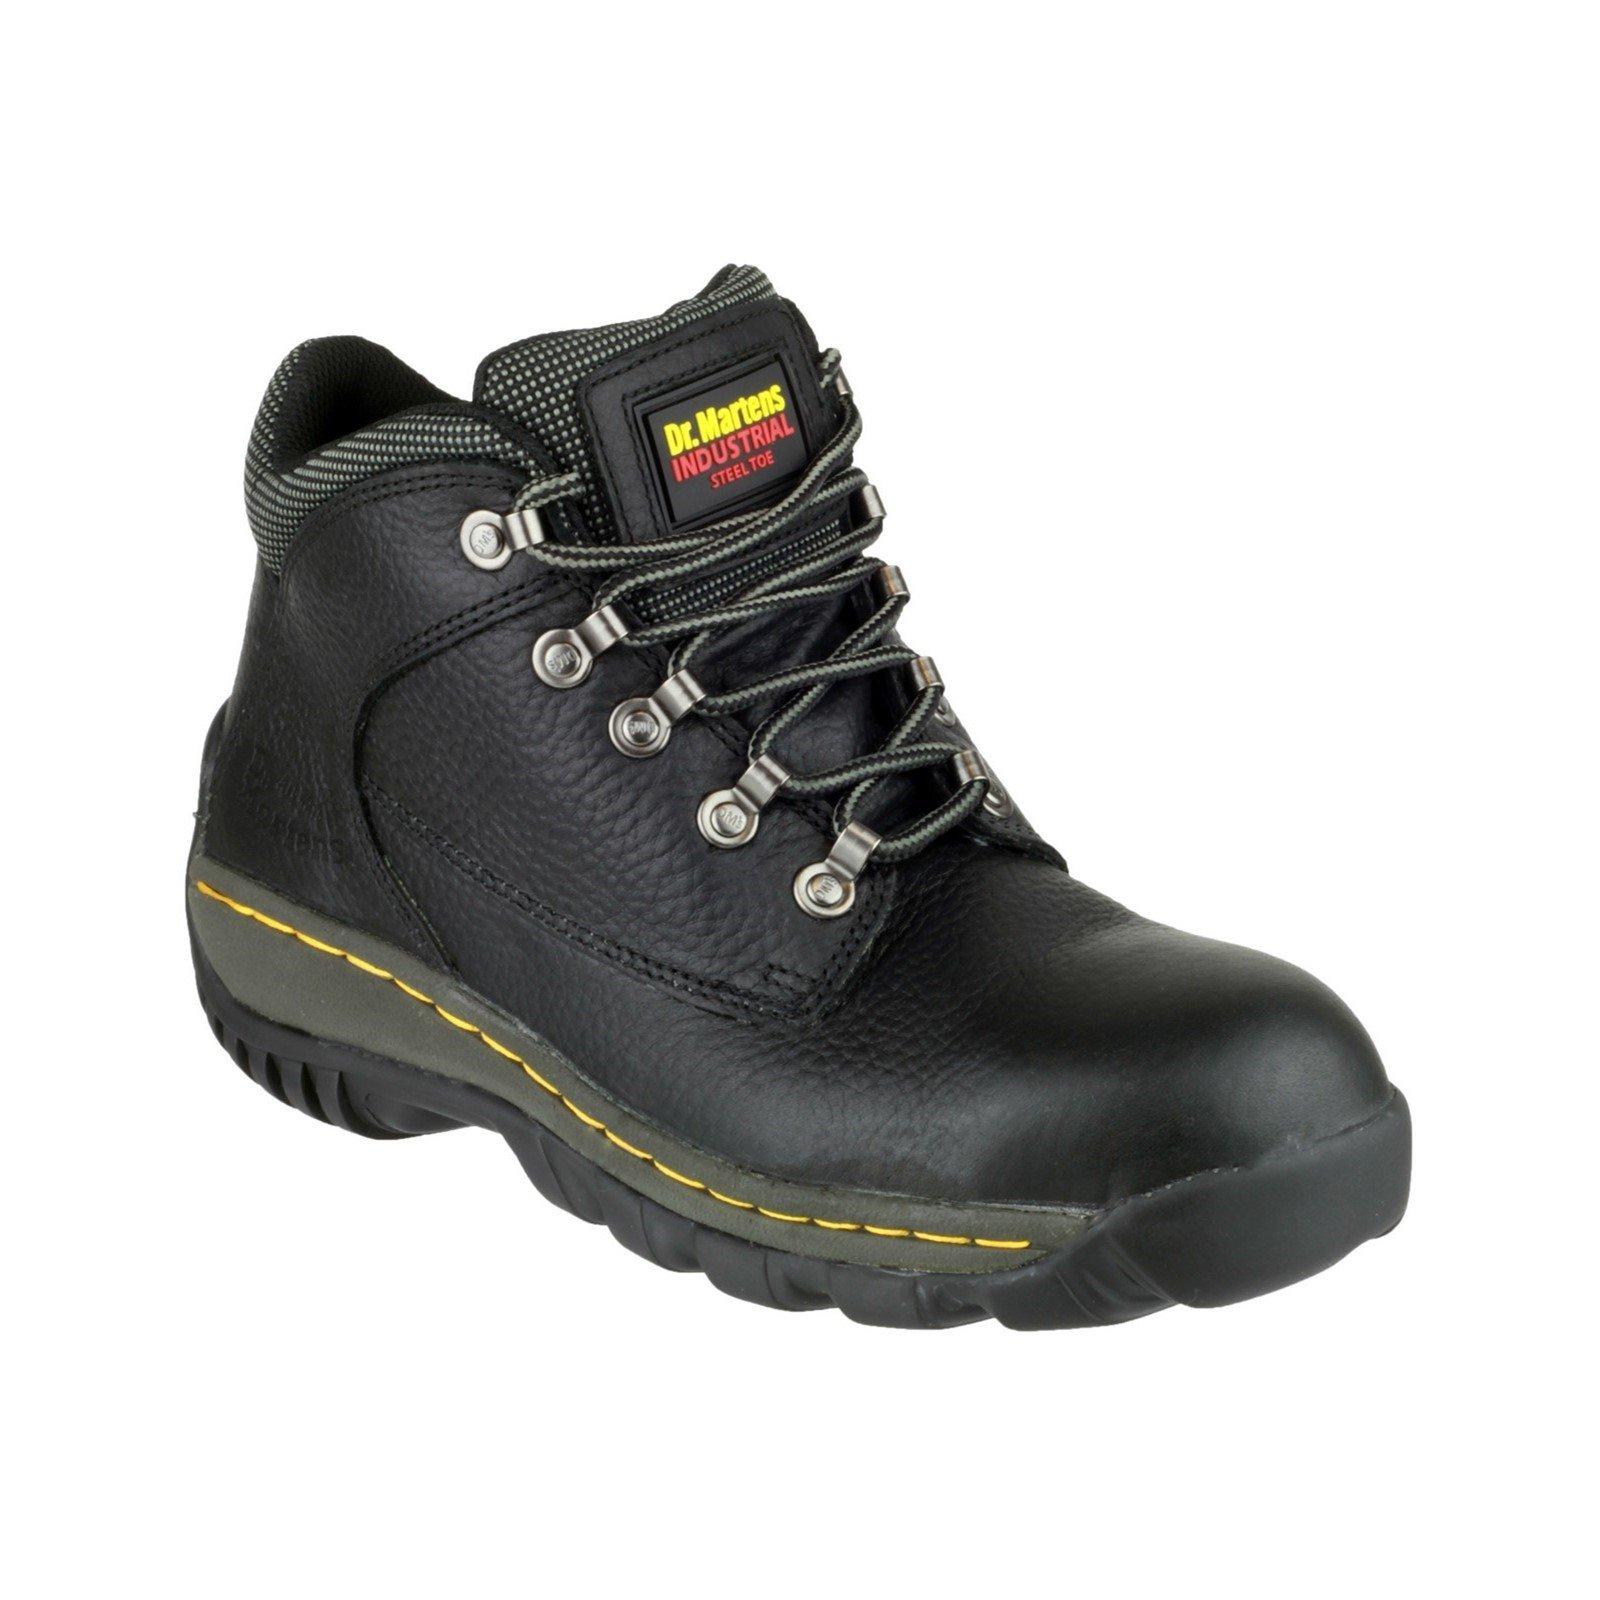 Dr Martens Unisex Lace-Up Boot Black 05207 - Black 9